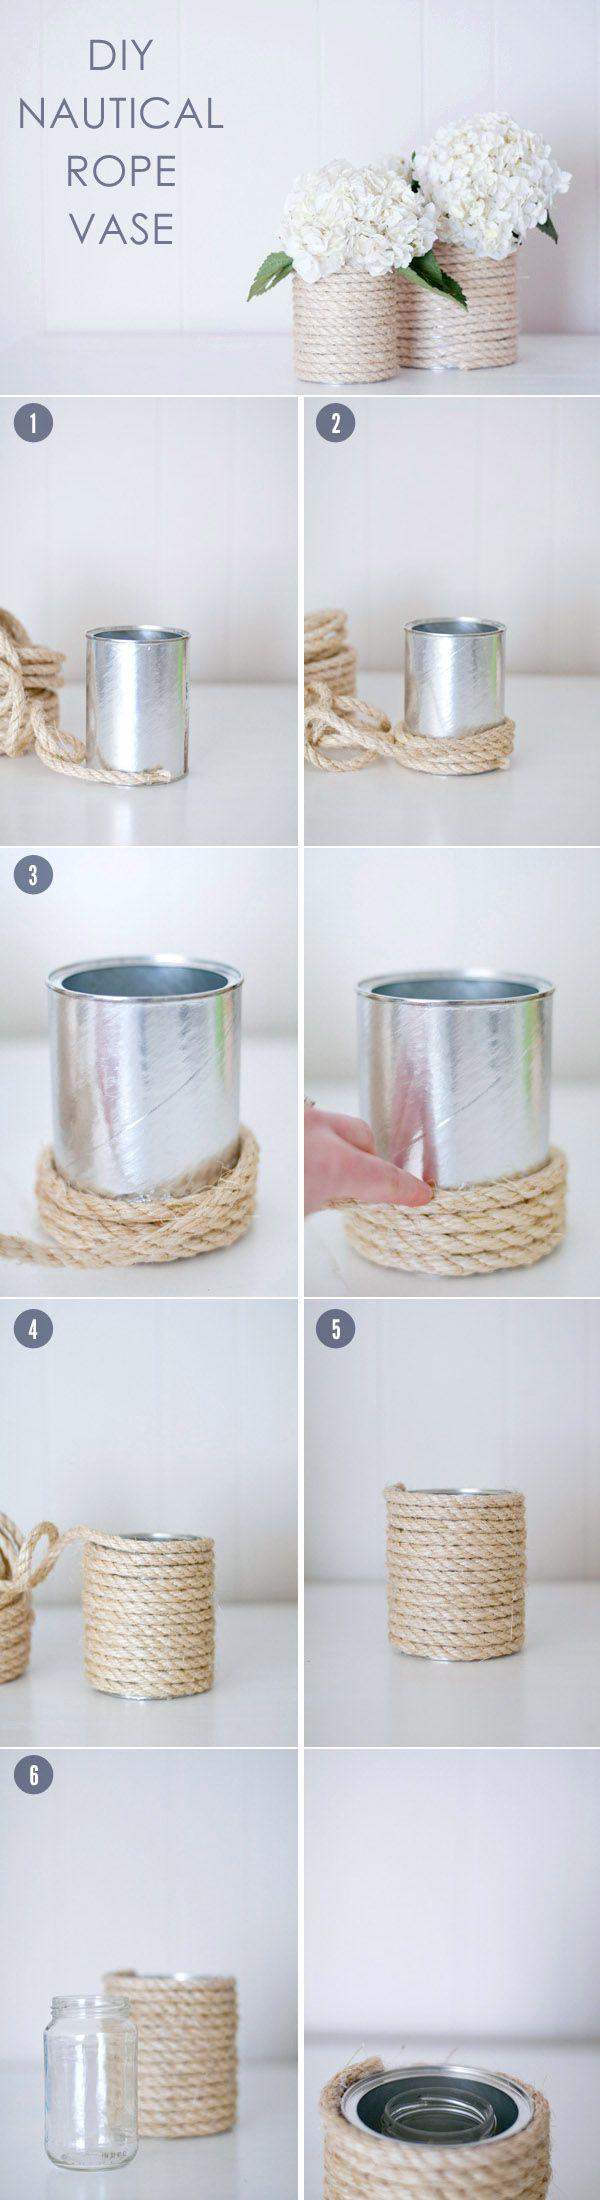 10 creative diy wedding centerpieces with tutorials juta diy wedding flowers centerpiece ideas with nautical rope vases junglespirit Choice Image